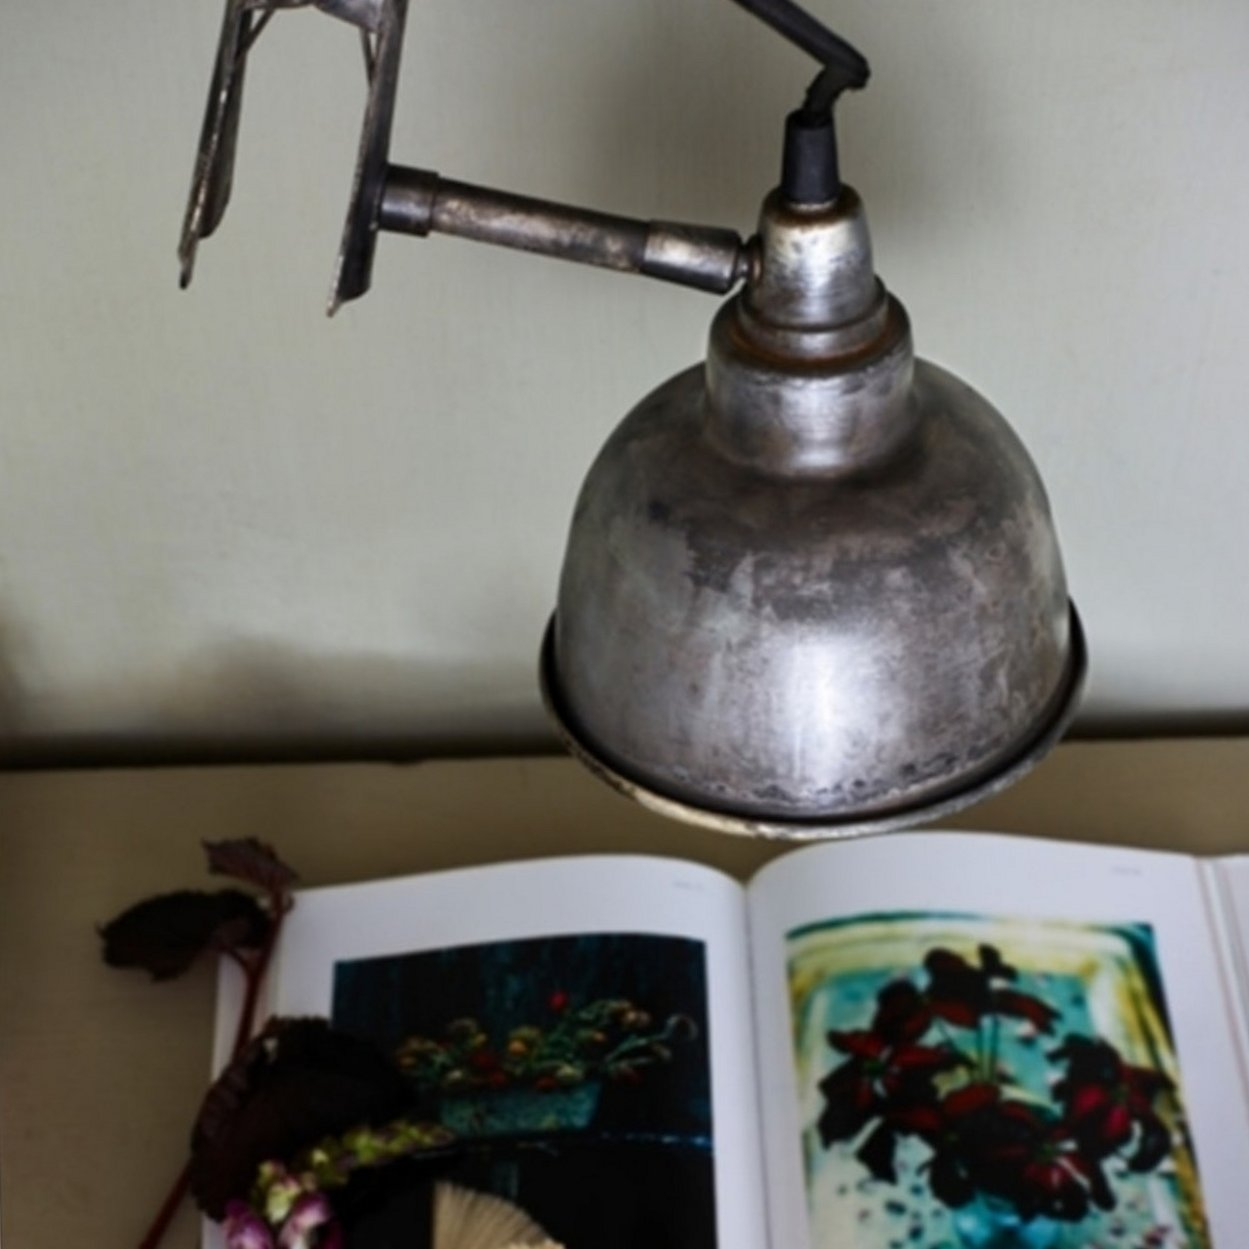 Industrial Clamp Lamp